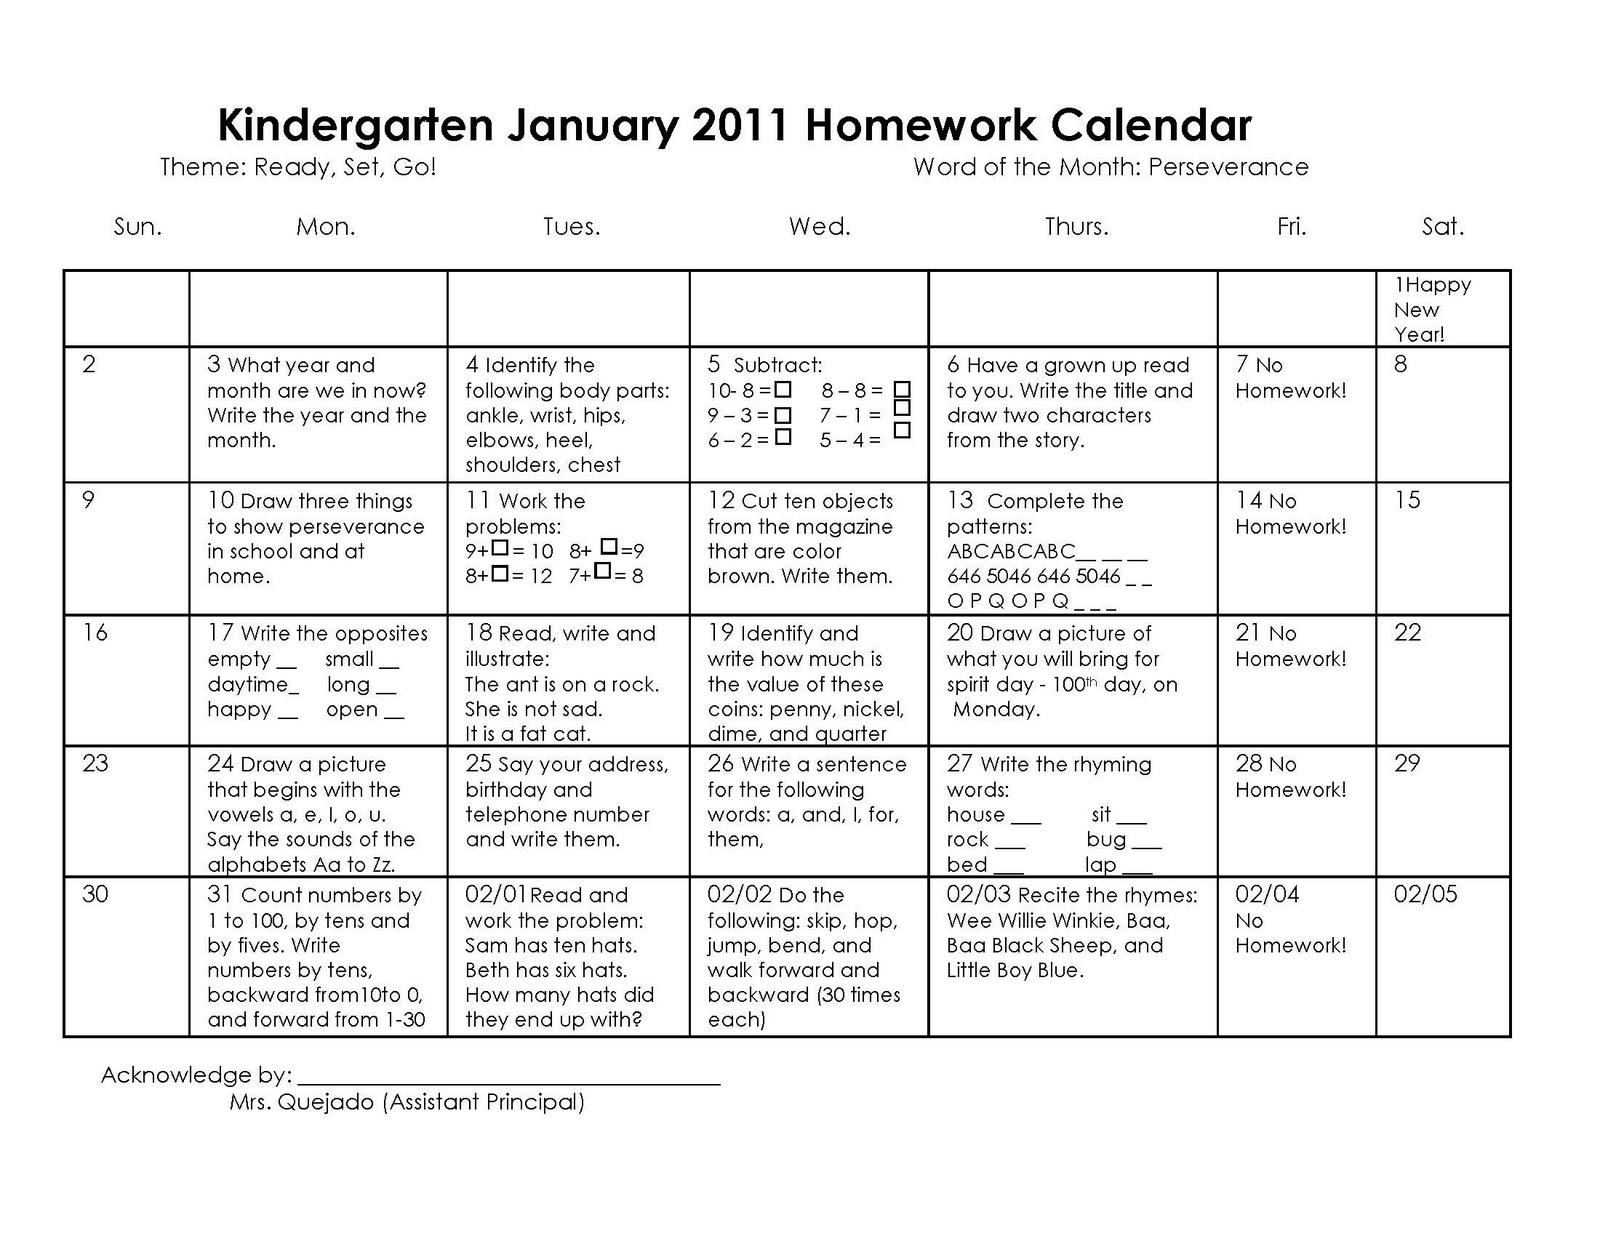 Monthly Homework Calendars For Kindergarten